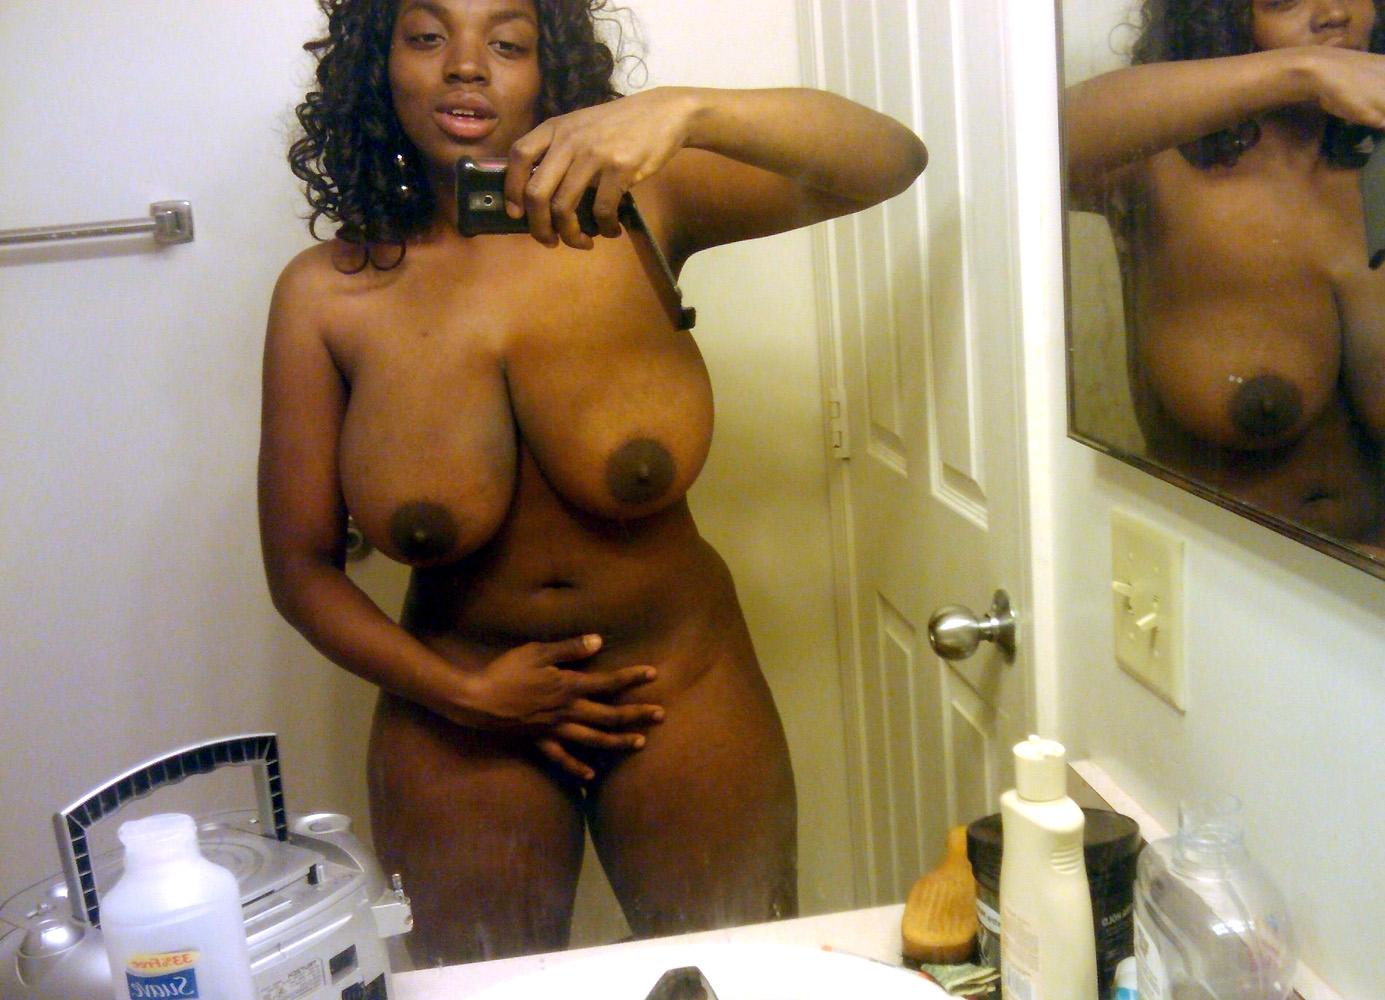 Milf Pornstar Rebeca Linares Takes Off Her Amazing Black Milf